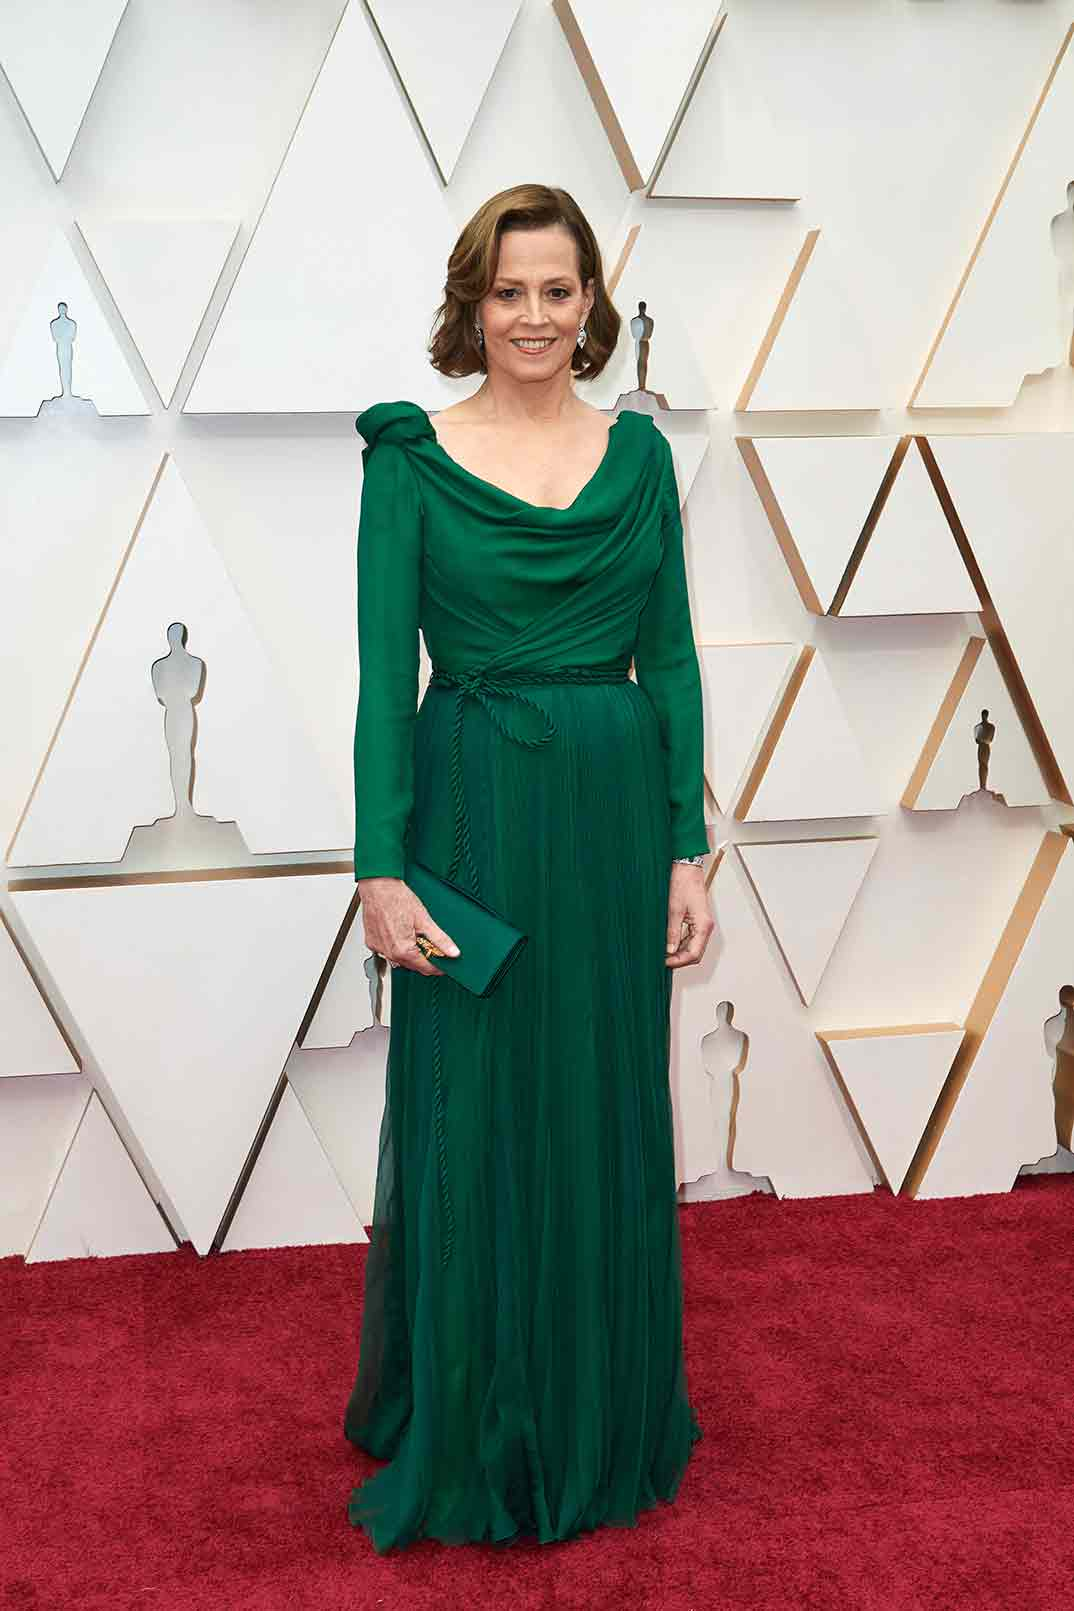 Sigourney Weaver - Oscars 2020 © A.M.P.A.S.